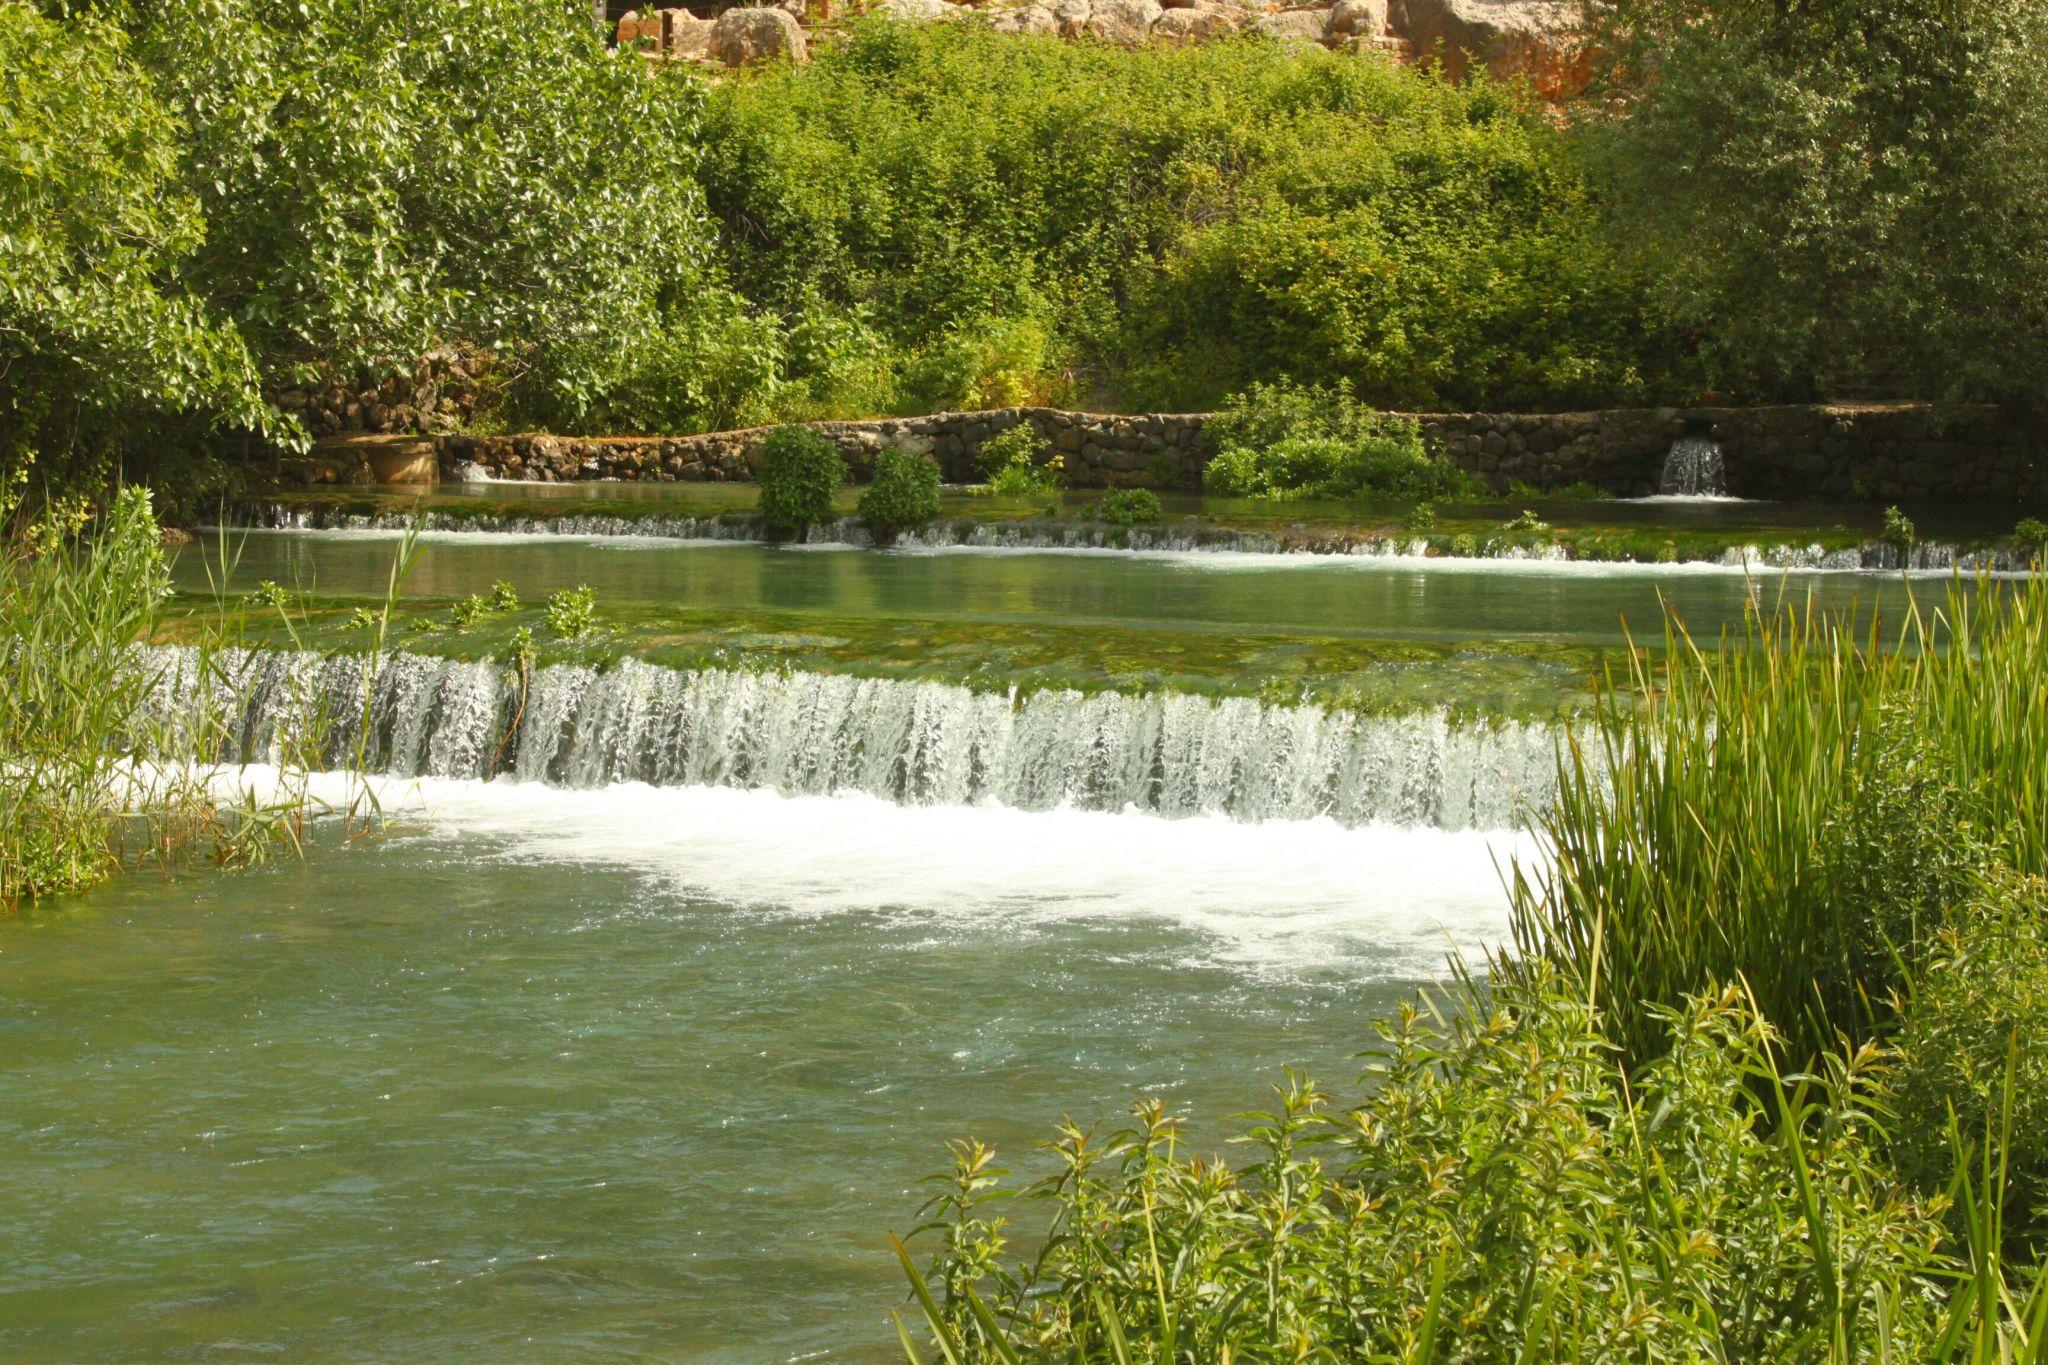 Jordanquelle, Israel